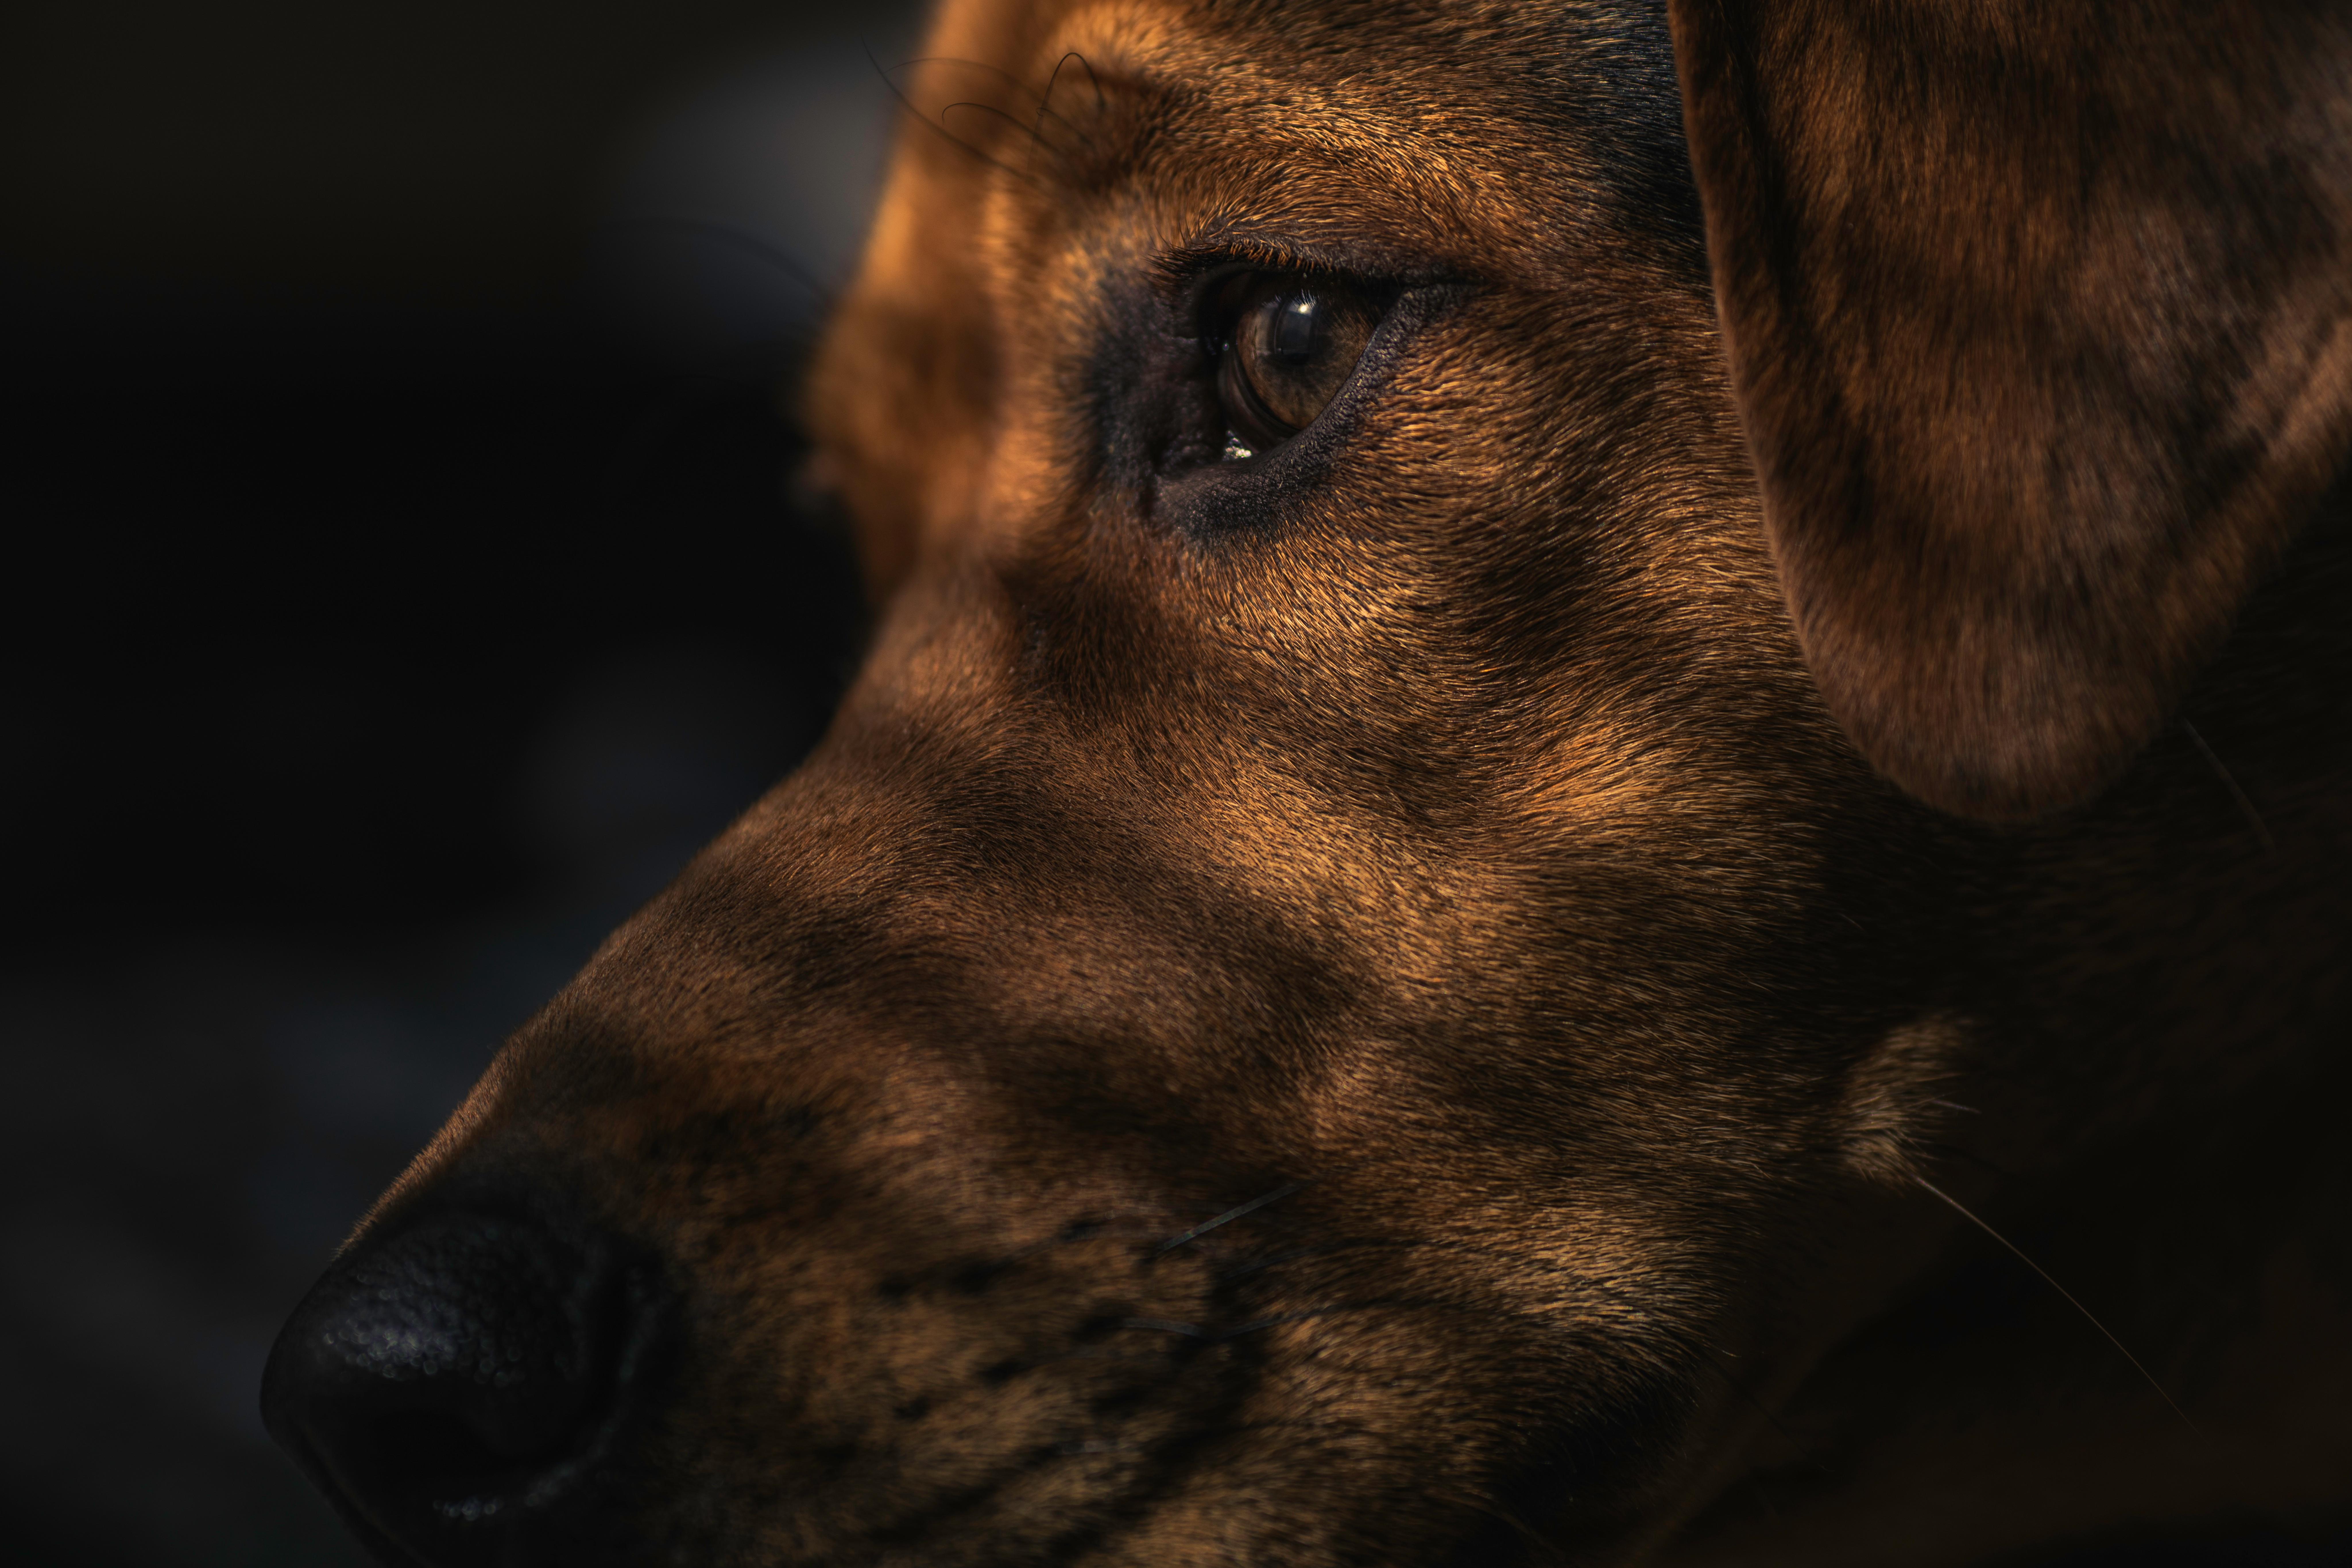 Focus, Animal, Brown, Close, Dog, HQ Photo